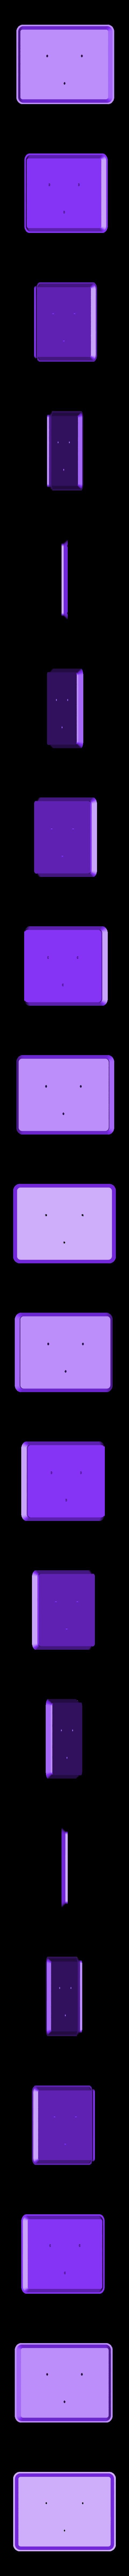 shaker-tray.stl Download free STL file Crickit Lab Shaker • Template to 3D print, Adafruit